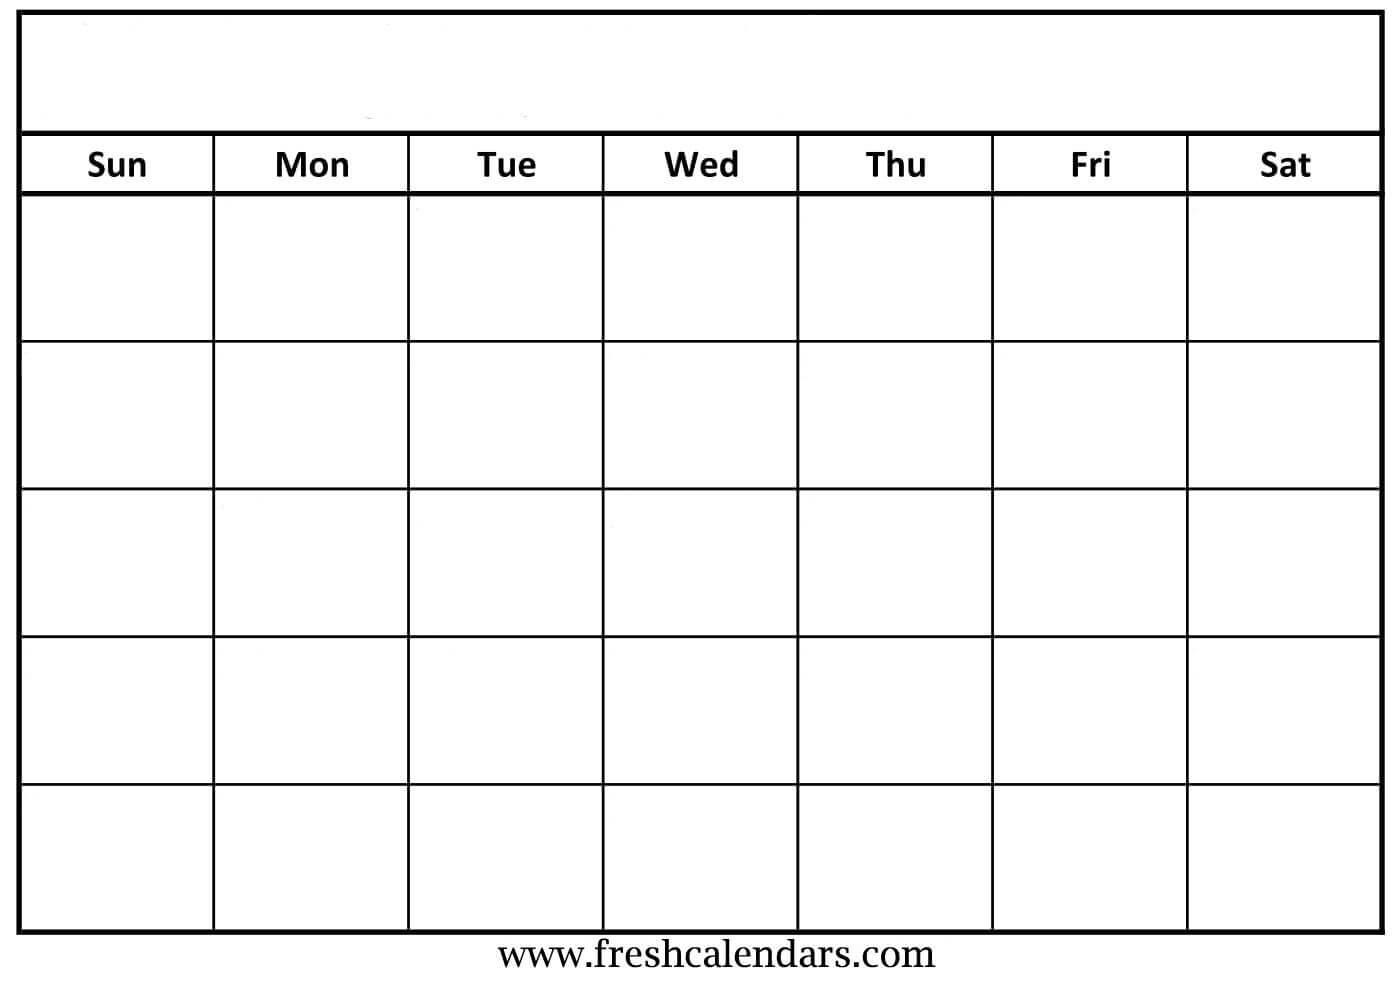 30 Blank Calendar Template 2019 | Andaluzseattle Template In Blank Calander Template